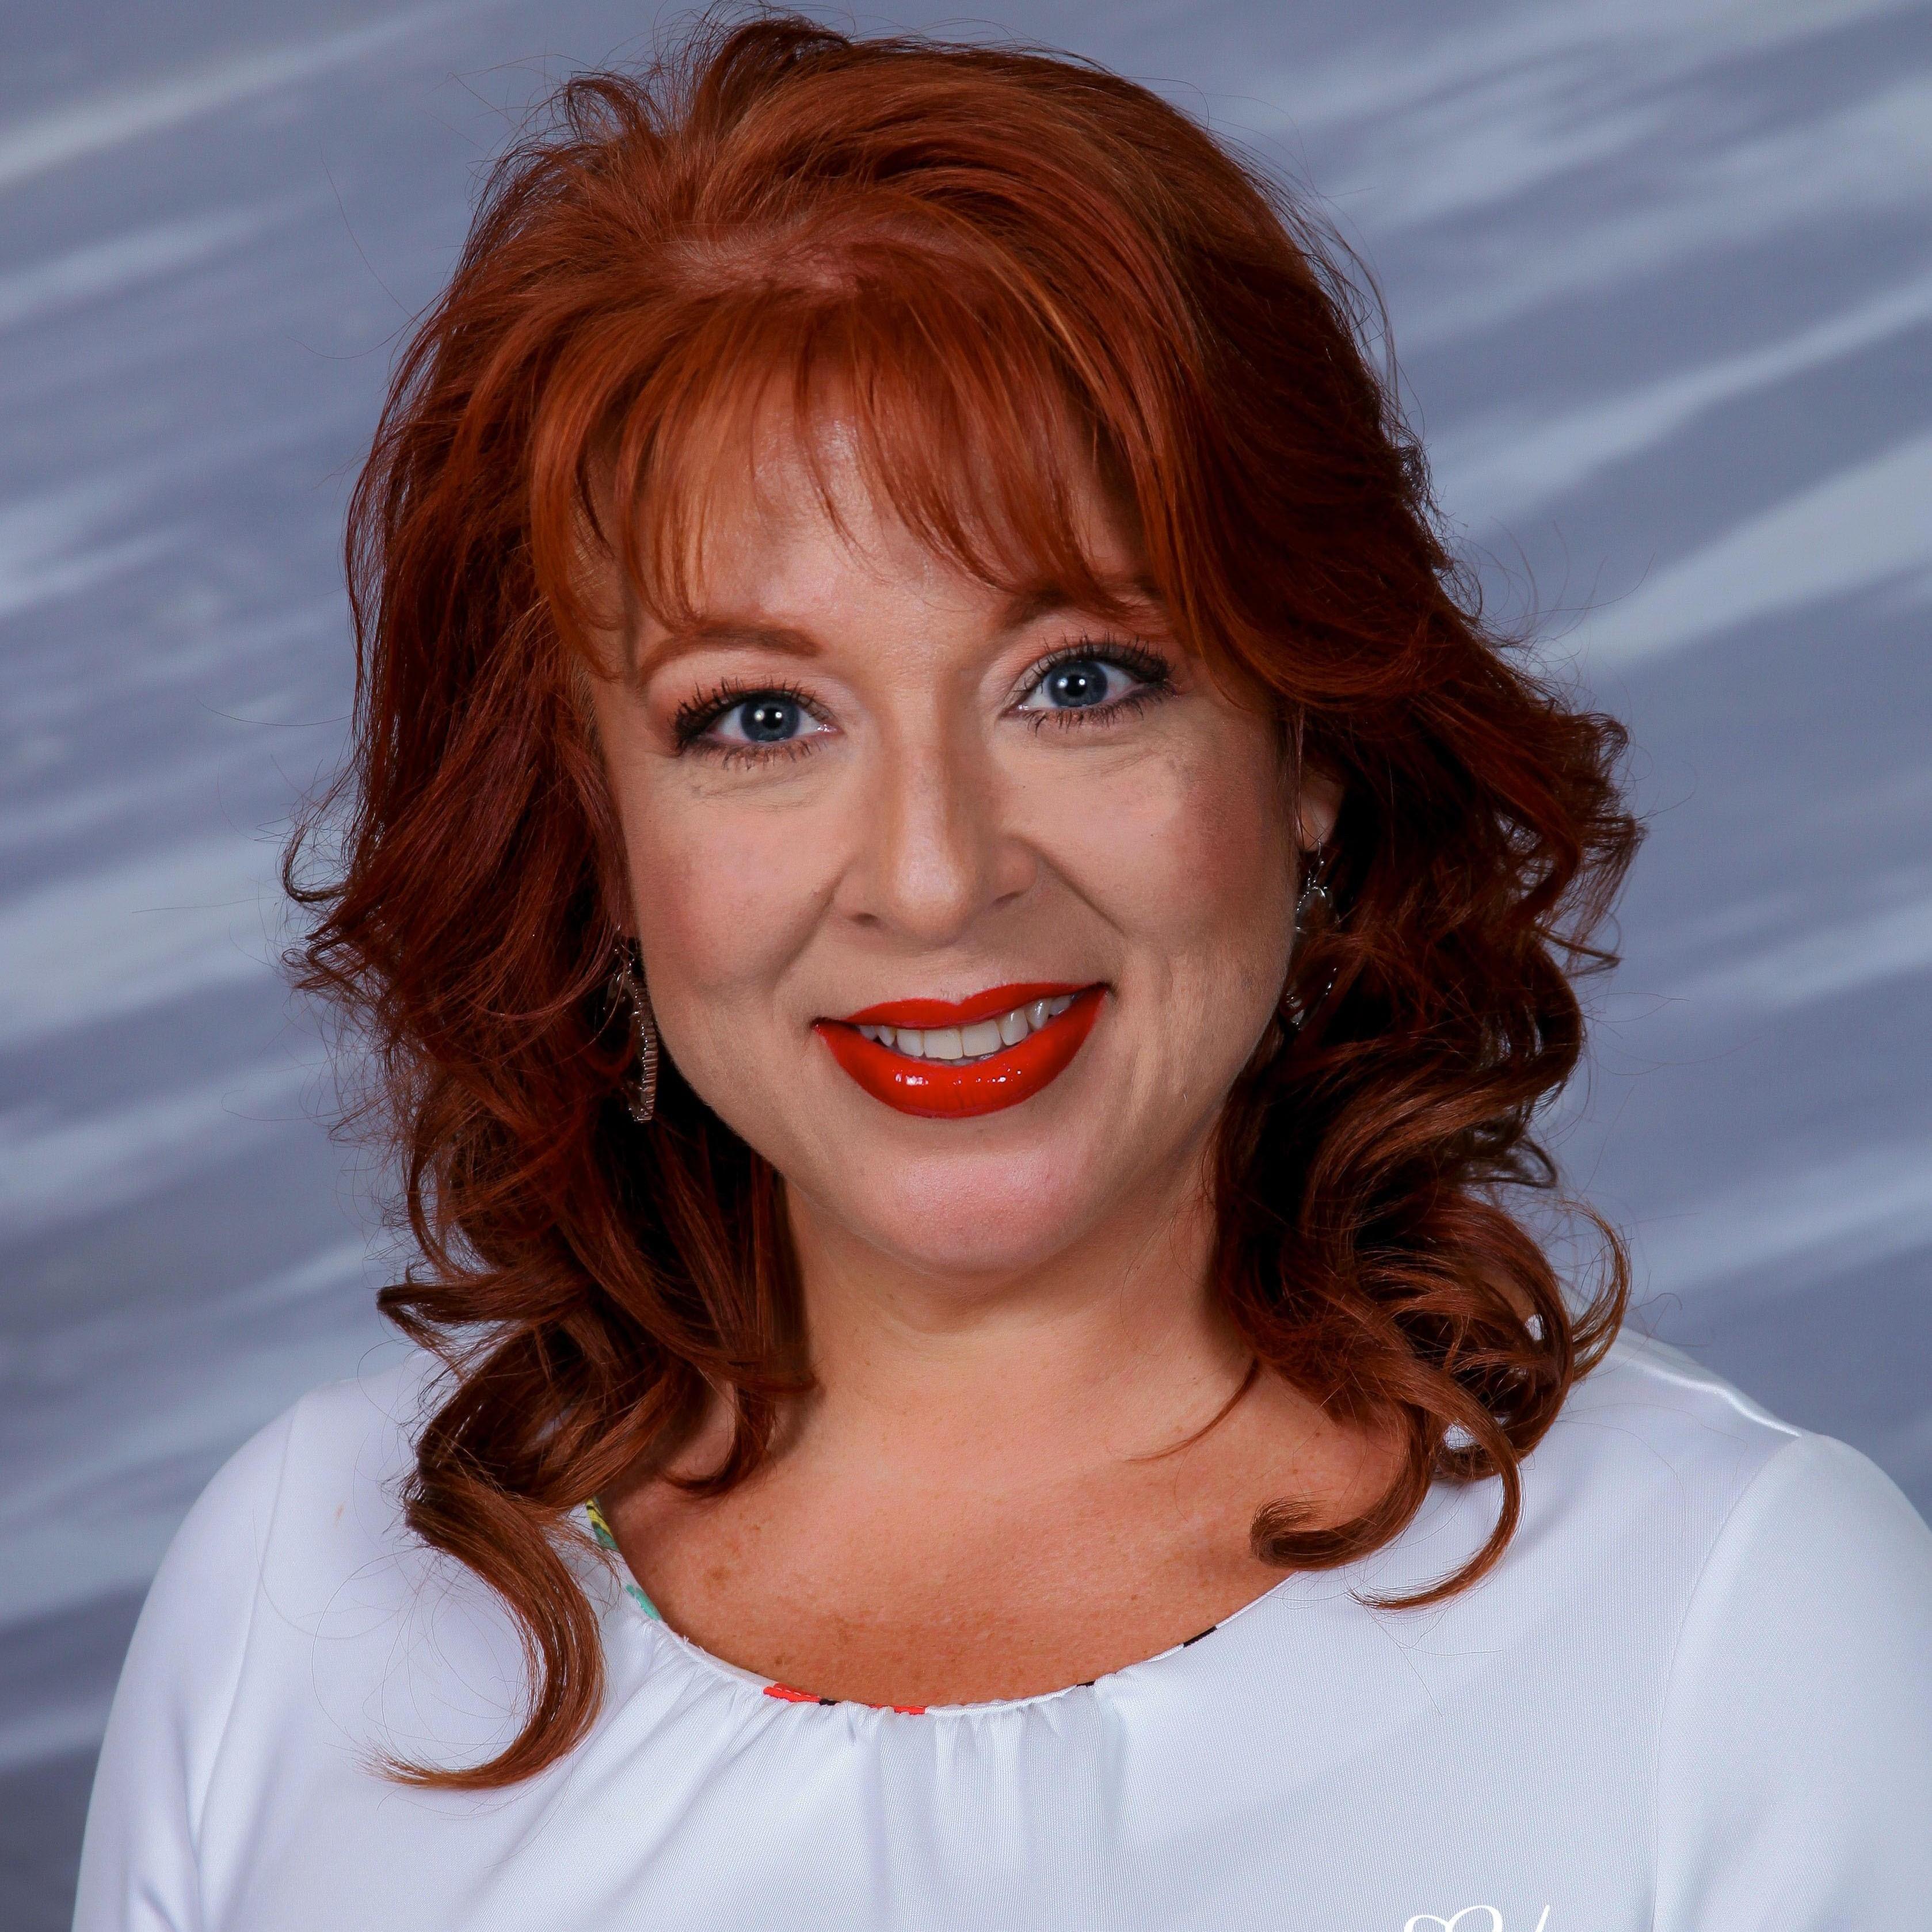 Sabrina Mcbride's Profile Photo